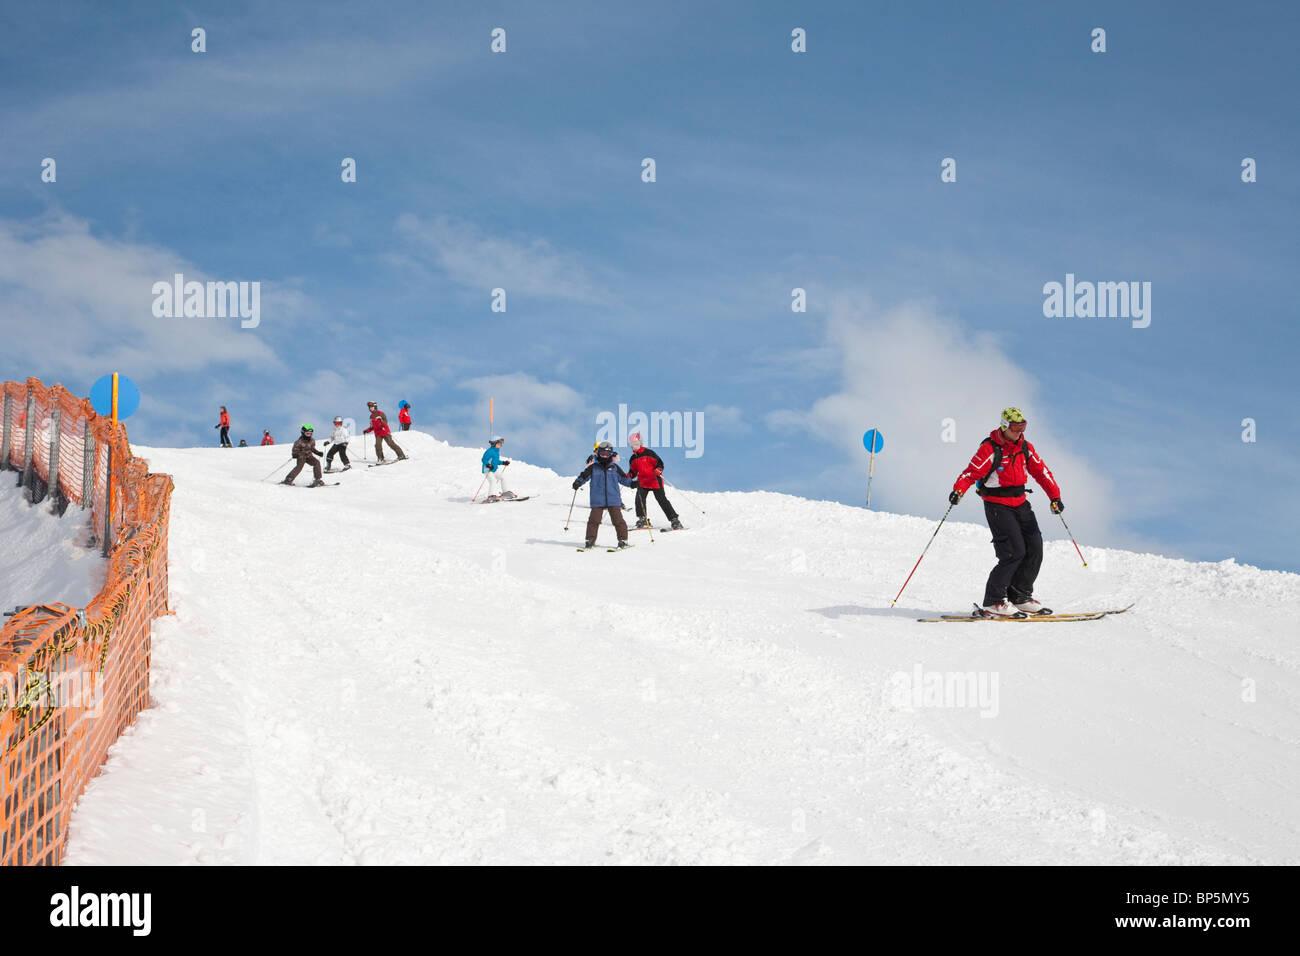 SKI SCHOOL FOR CHILDREN, GROUP OF SKIERS, SKIING REGION AT FELLHORN MOUNTAIN, NEAR OBERSTDORF,  ALLGAEU REGION, - Stock Image